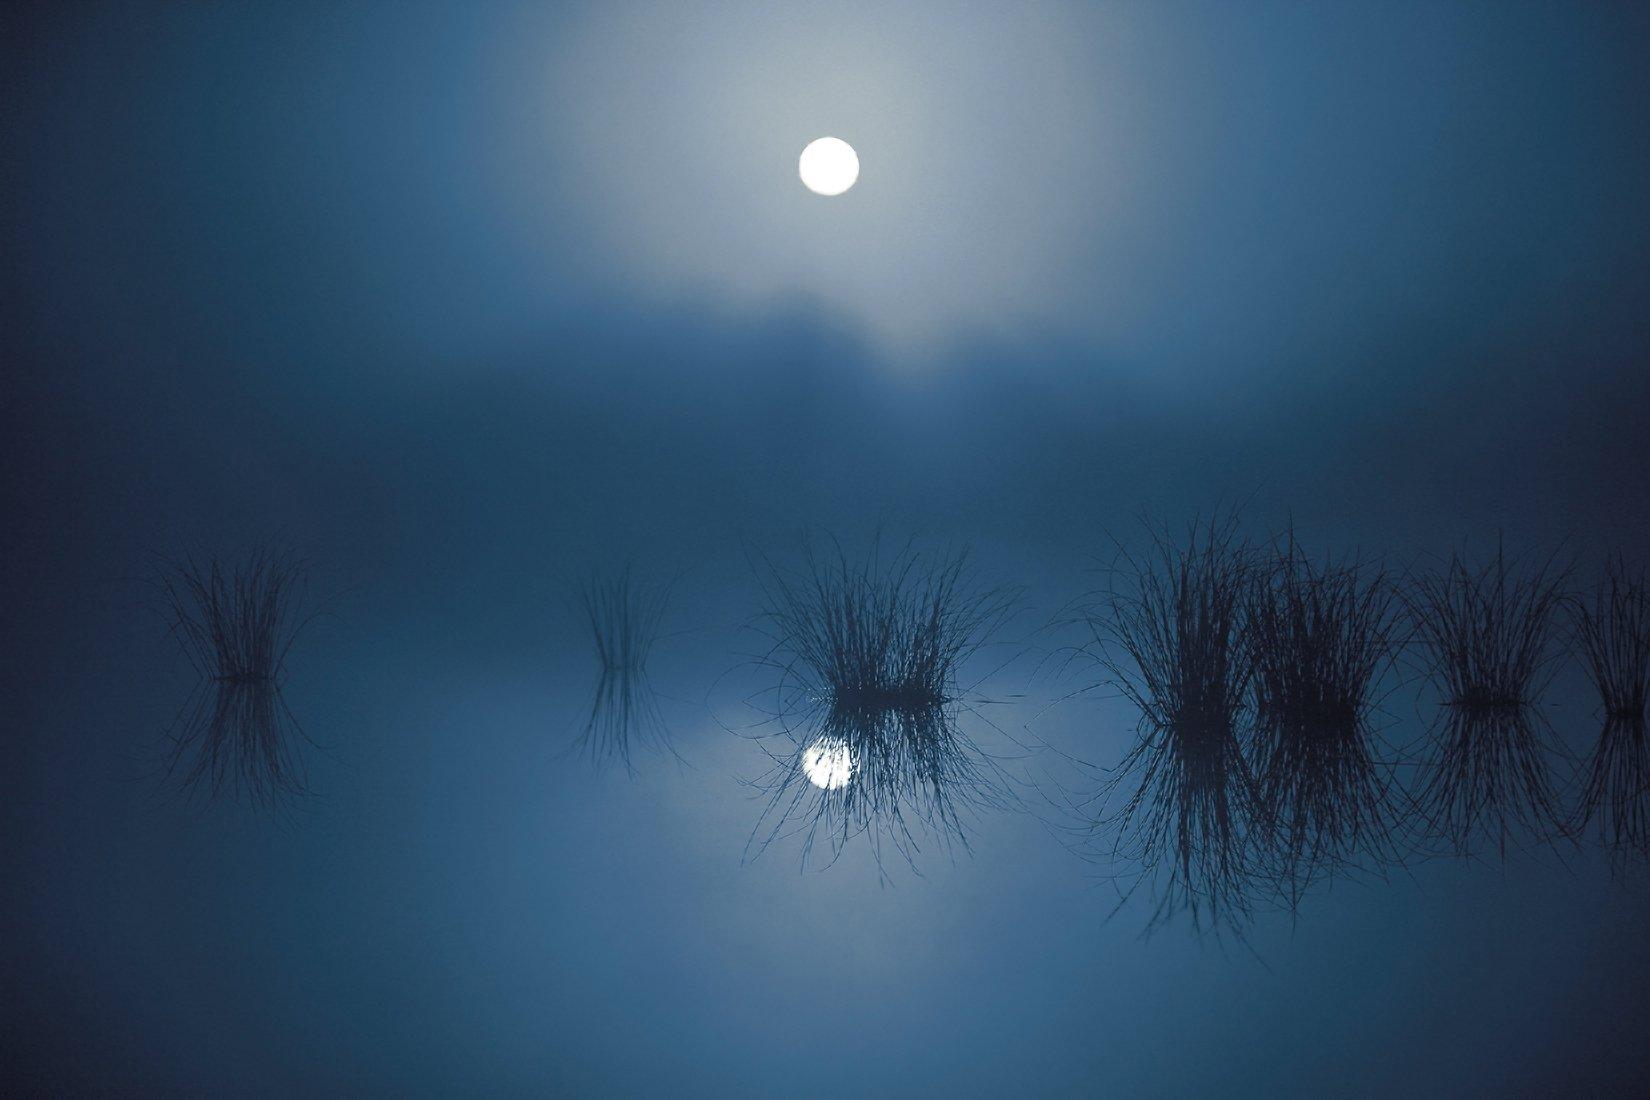 ночь,туман,болото,югра, Борис Полозков